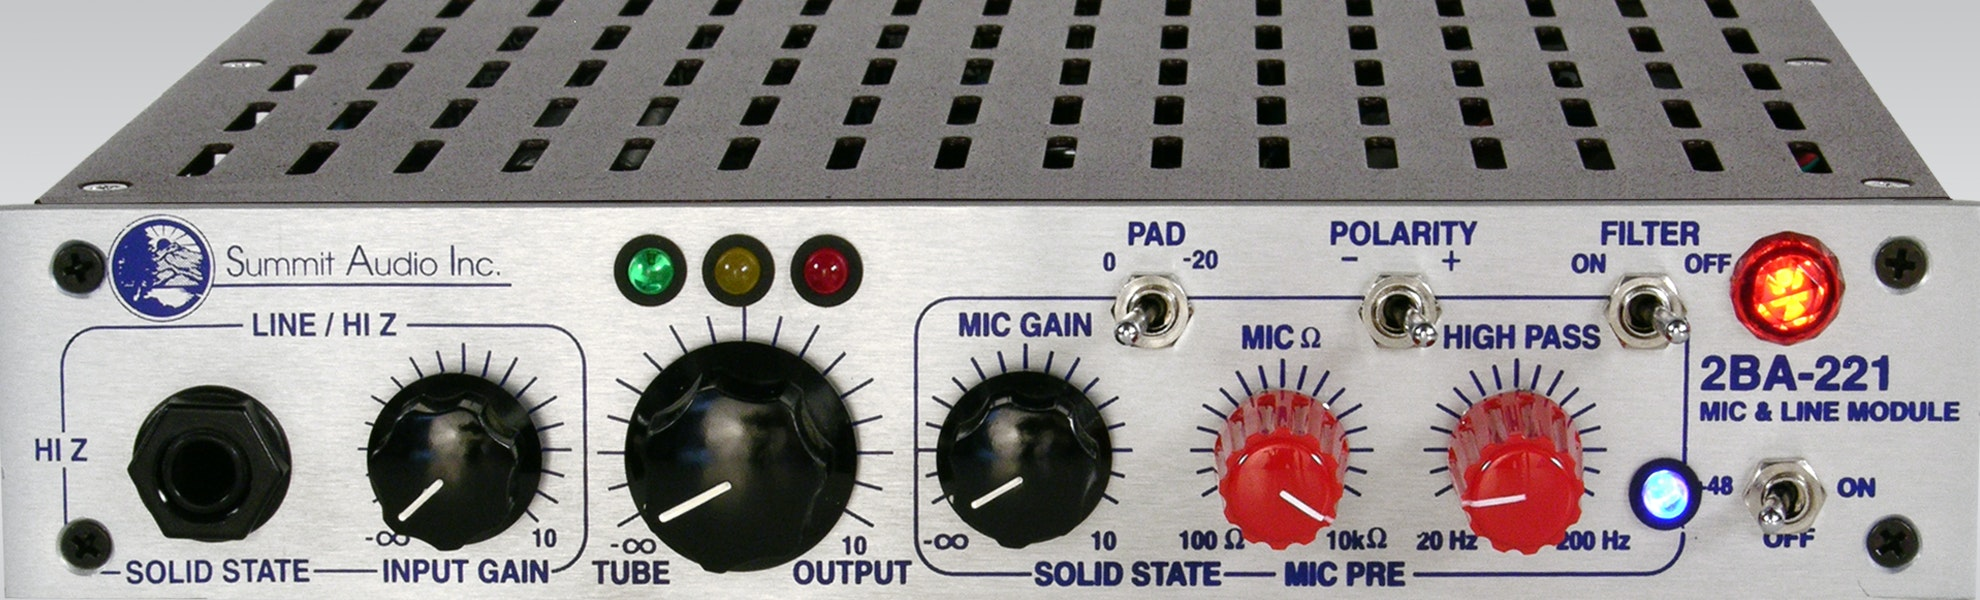 Summit Audio 2BA-221 Microphone Preamp